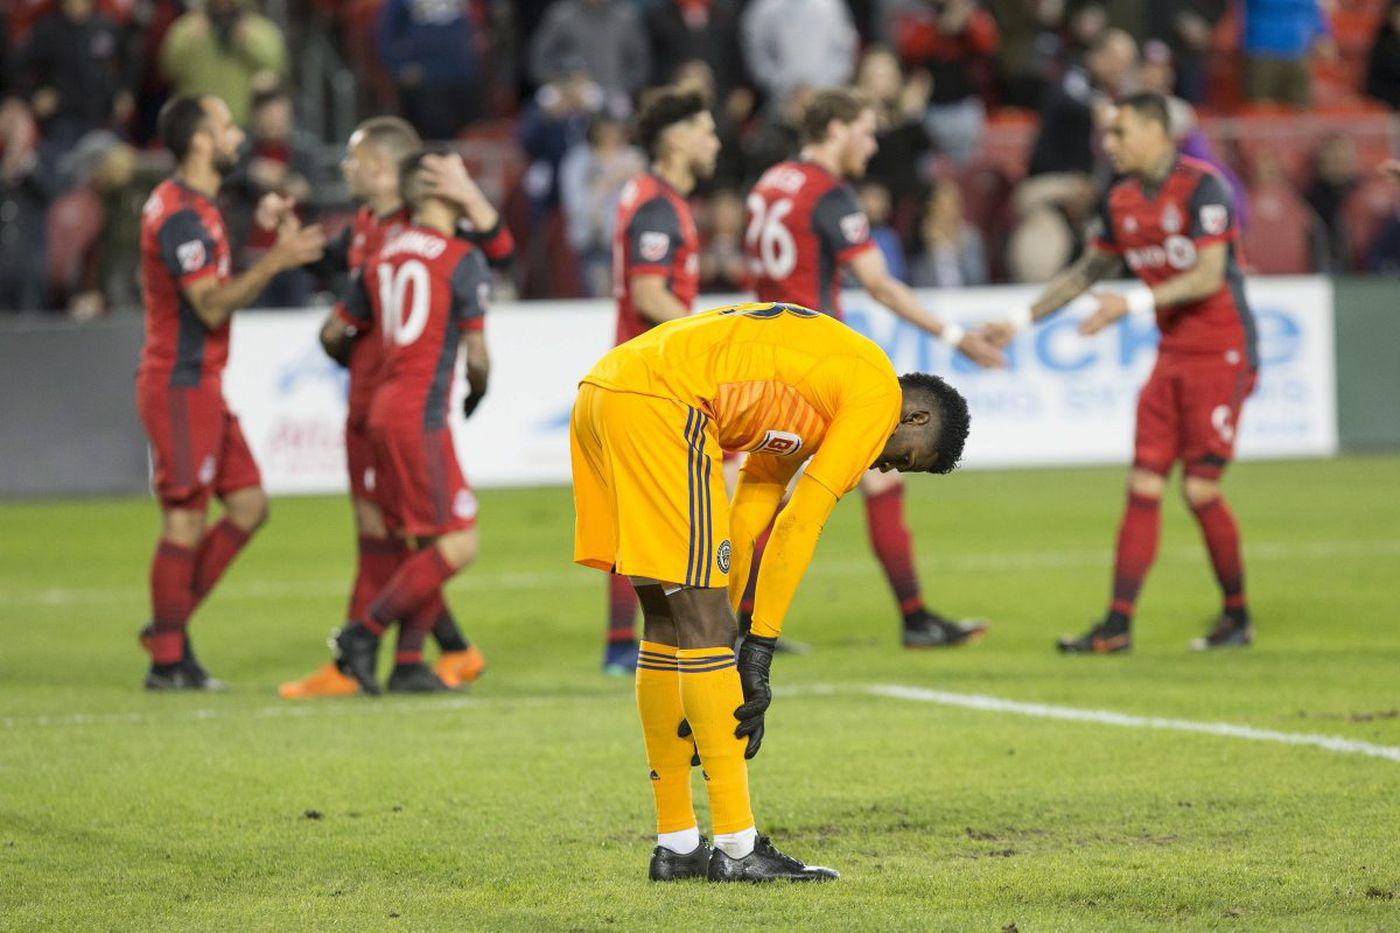 Sebastian Giovinco, Victor Vázquez lead Toronto FC's 3-0 blowout of Union